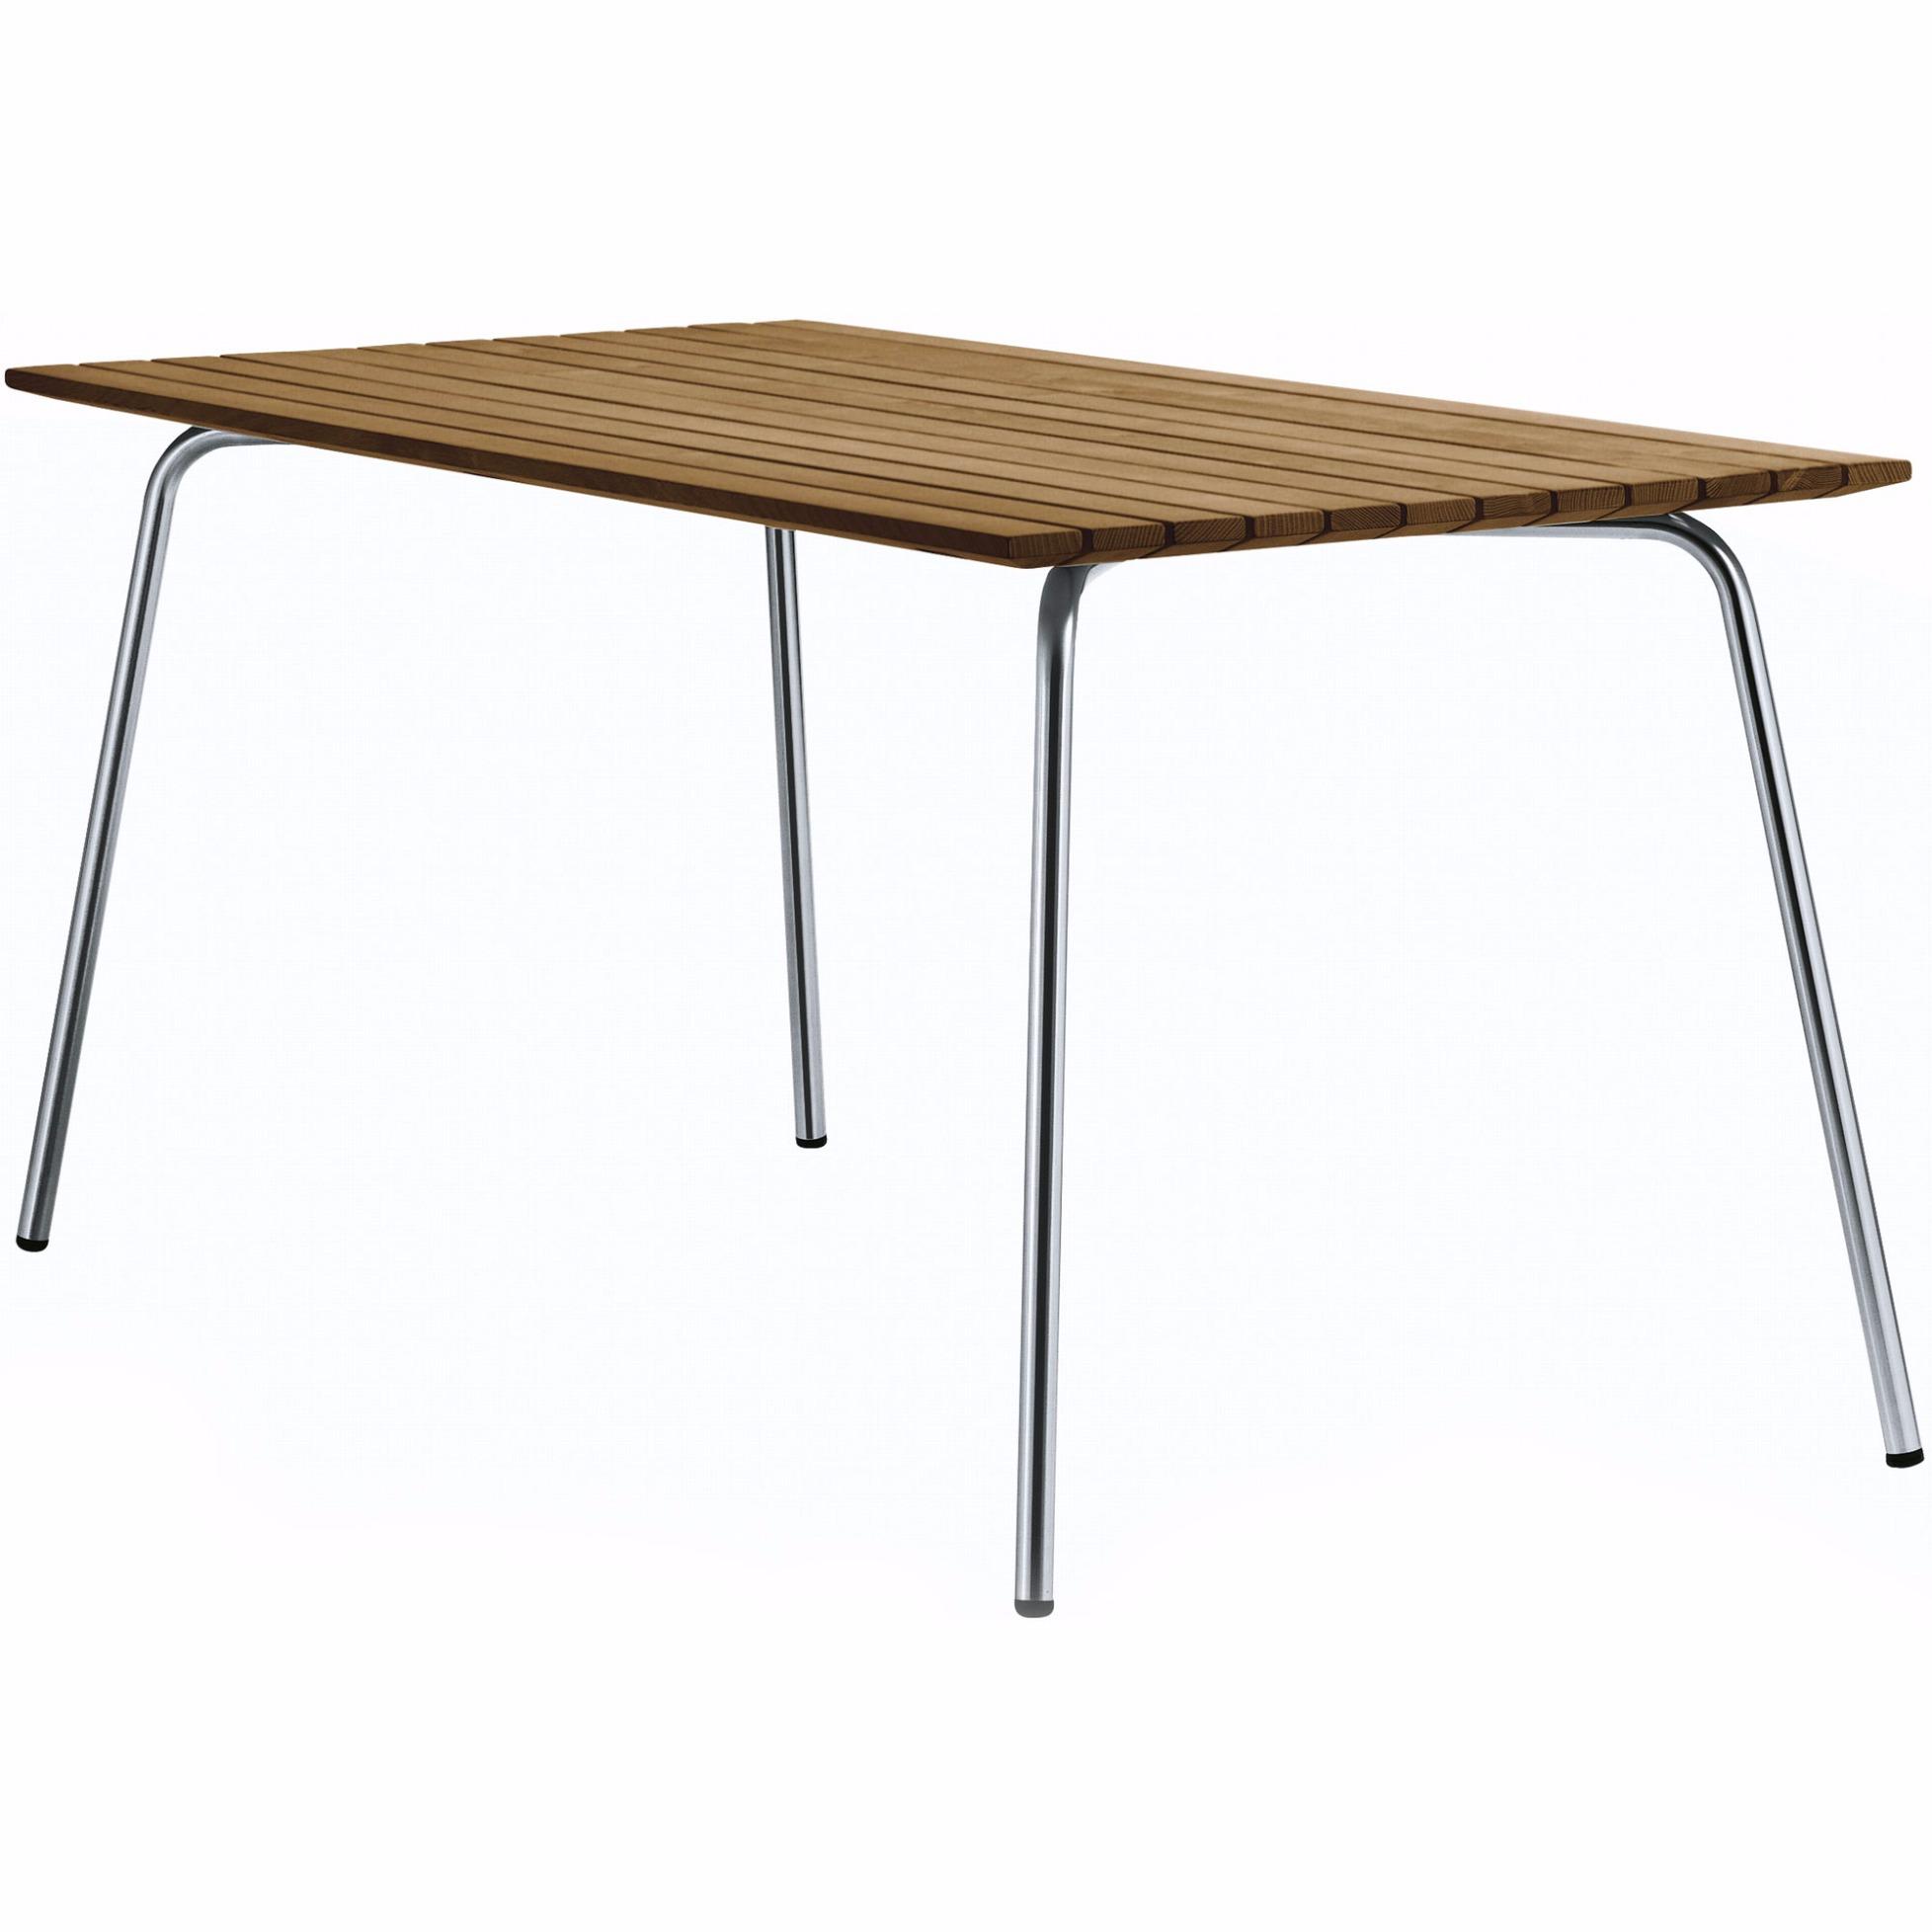 Brilliant S 1040 Thonet All Seasons Iroko Garden Table Ibusinesslaw Wood Chair Design Ideas Ibusinesslaworg